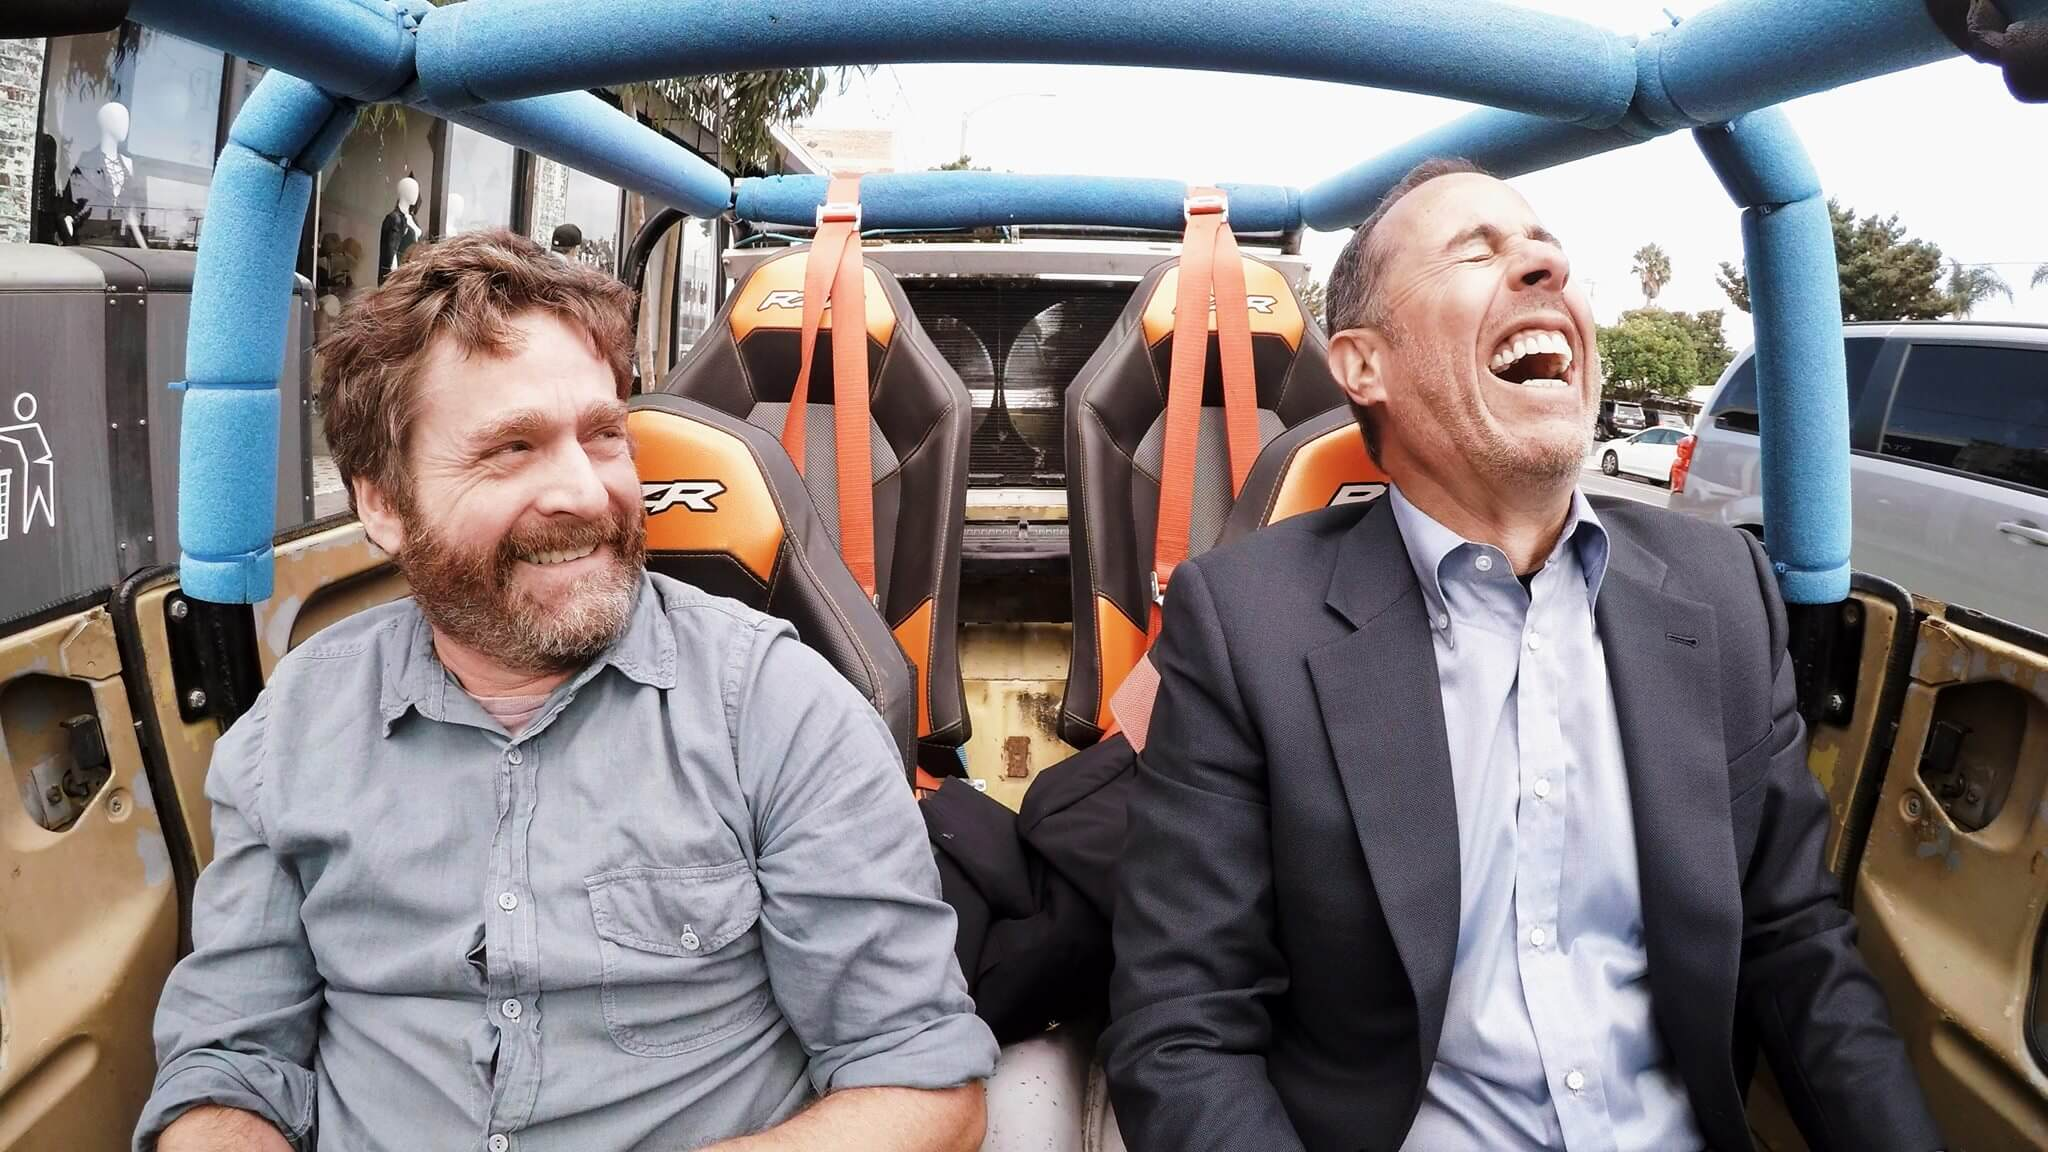 zach-galifianakis-comedians-in-cars-getting-coffee.jpg